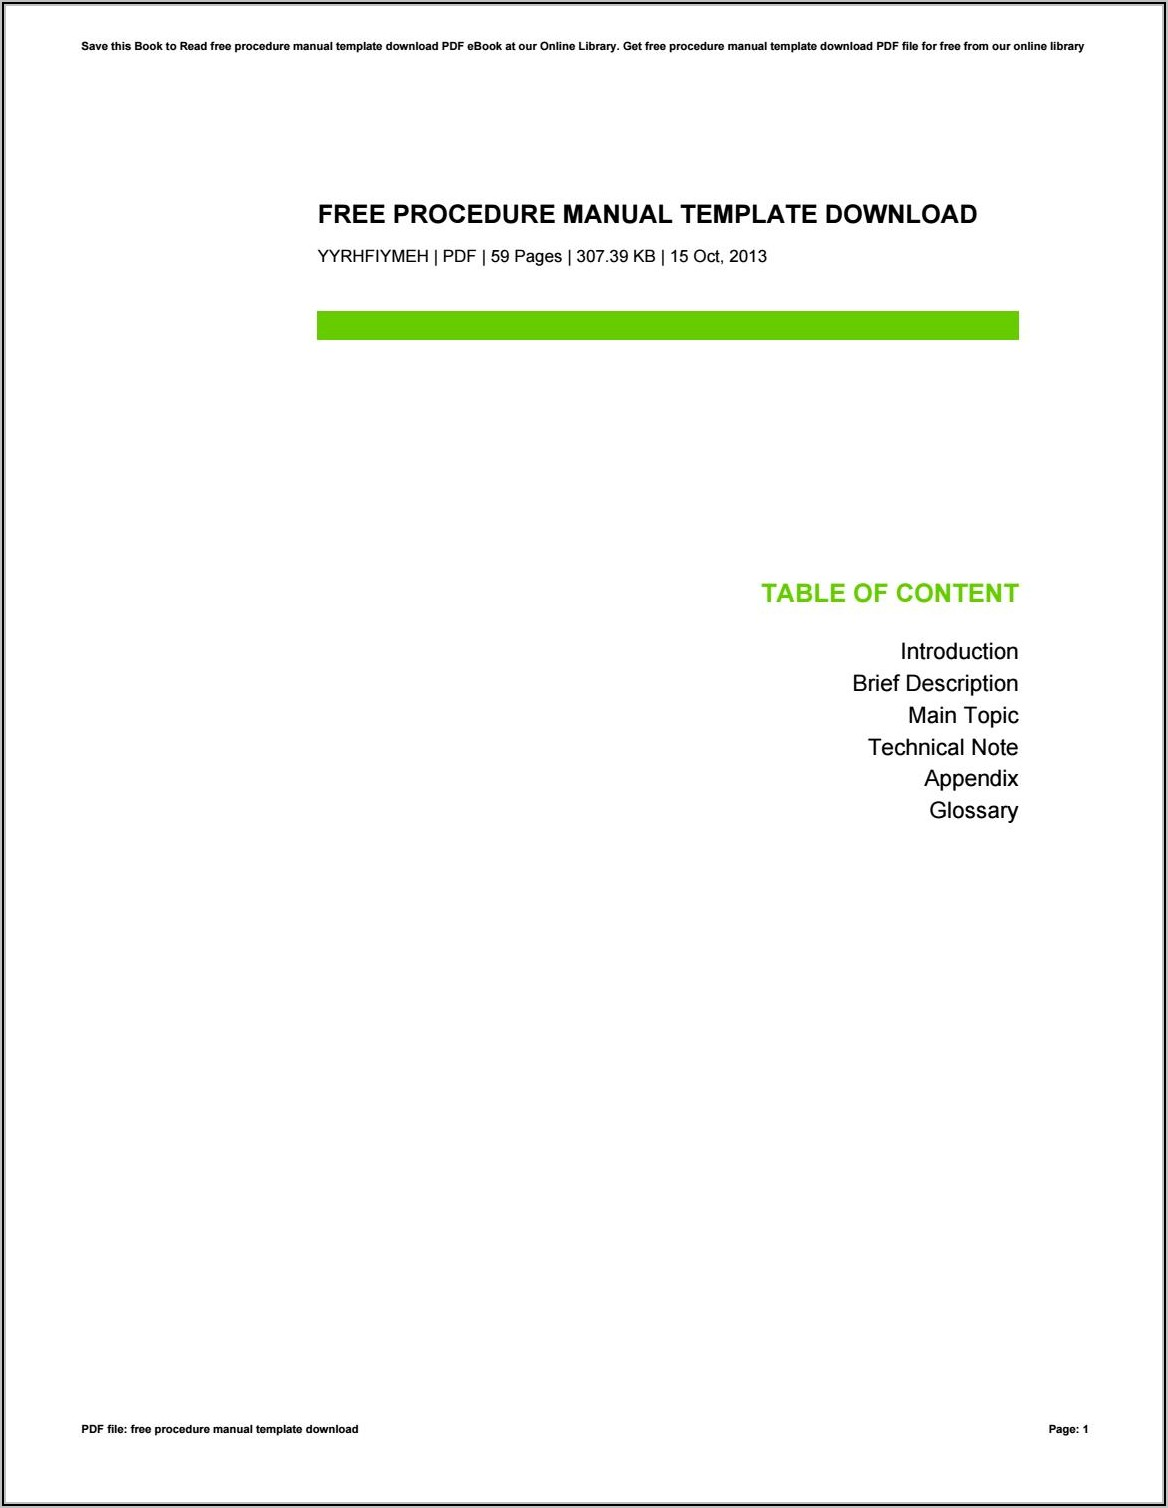 Procedure Manual Template Free Download